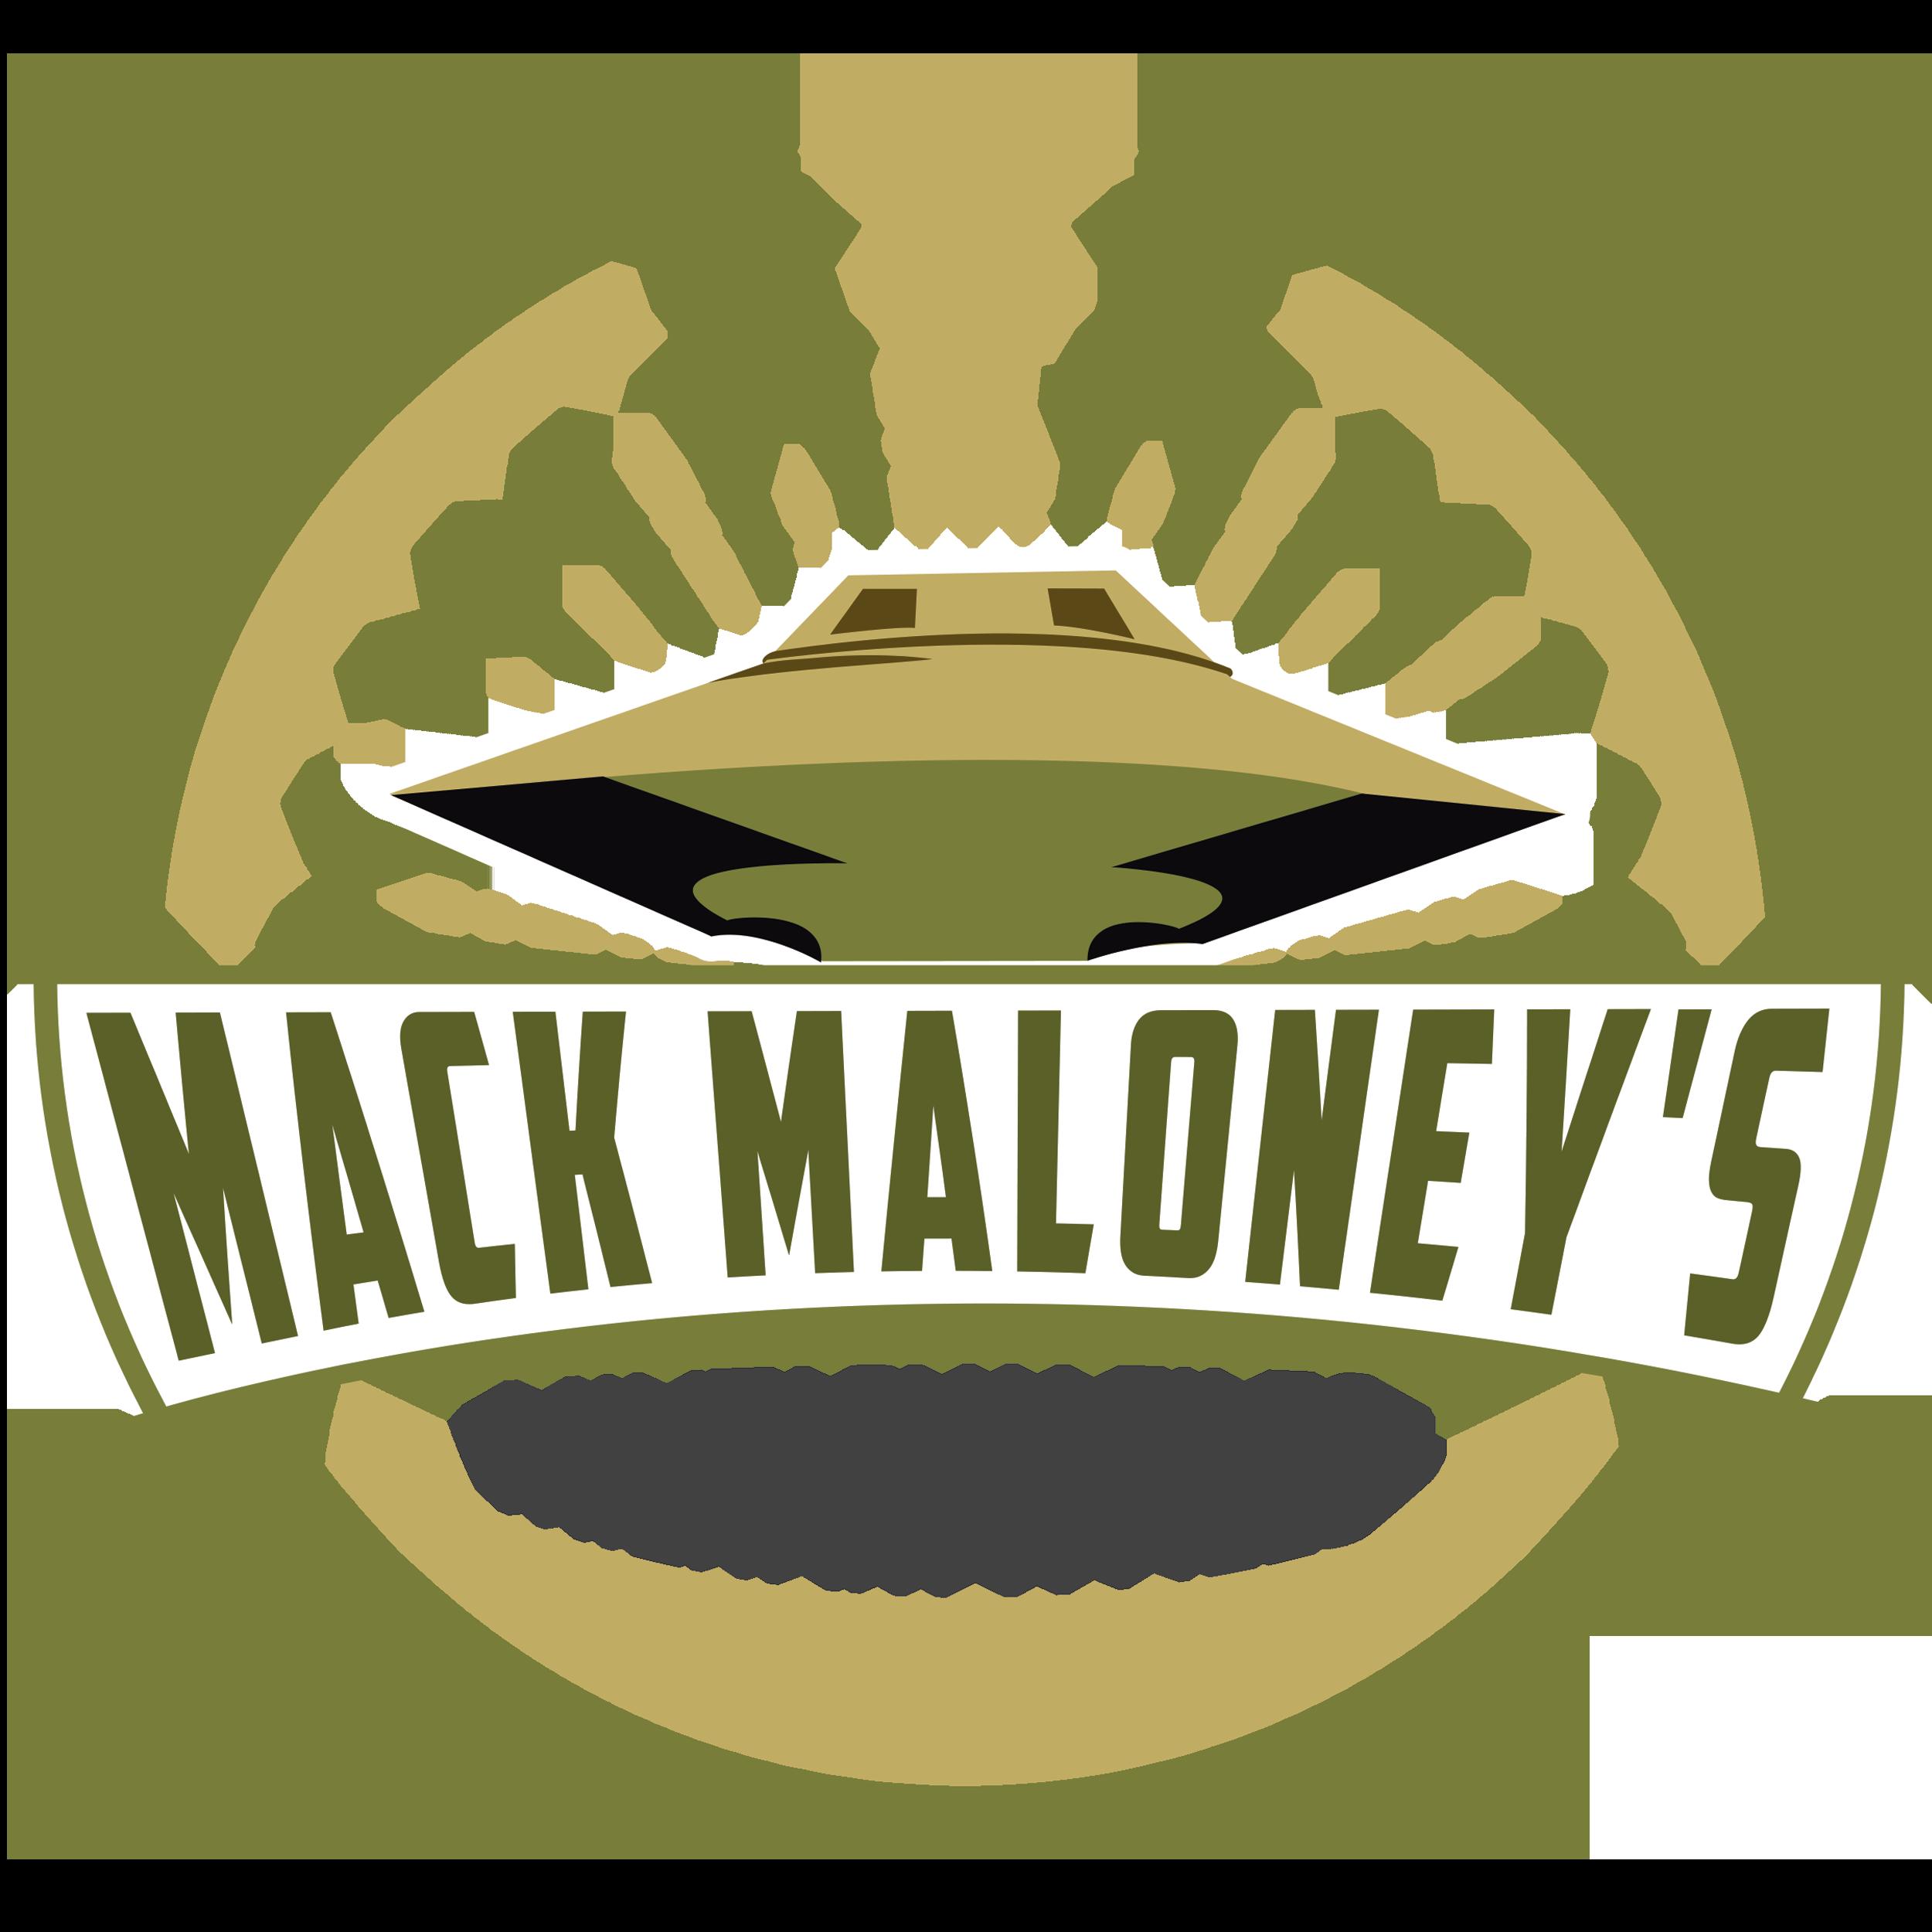 military-xfiles_logo_2500x2500